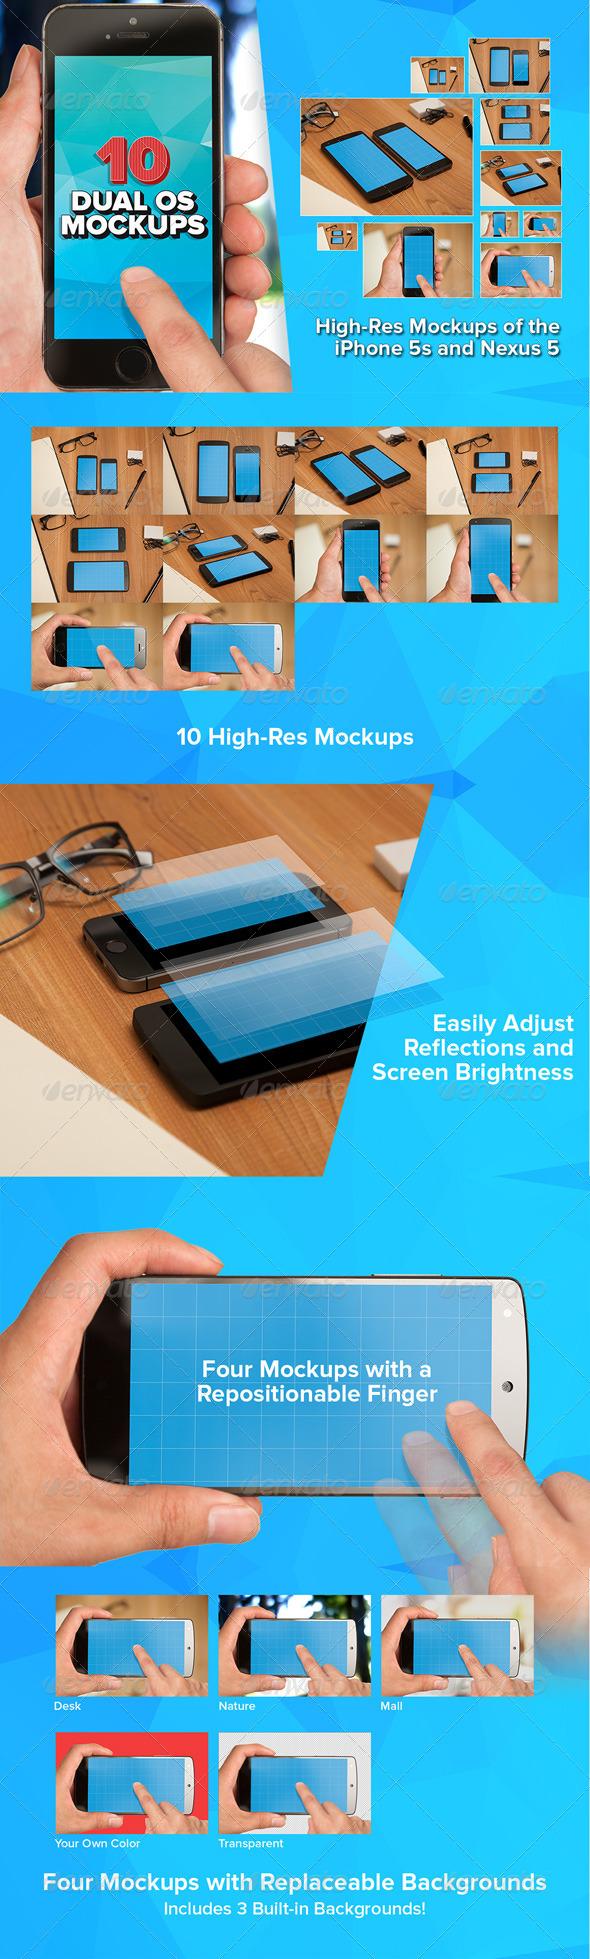 10 Smartphone Dual-OS Mockups - Mobile Displays